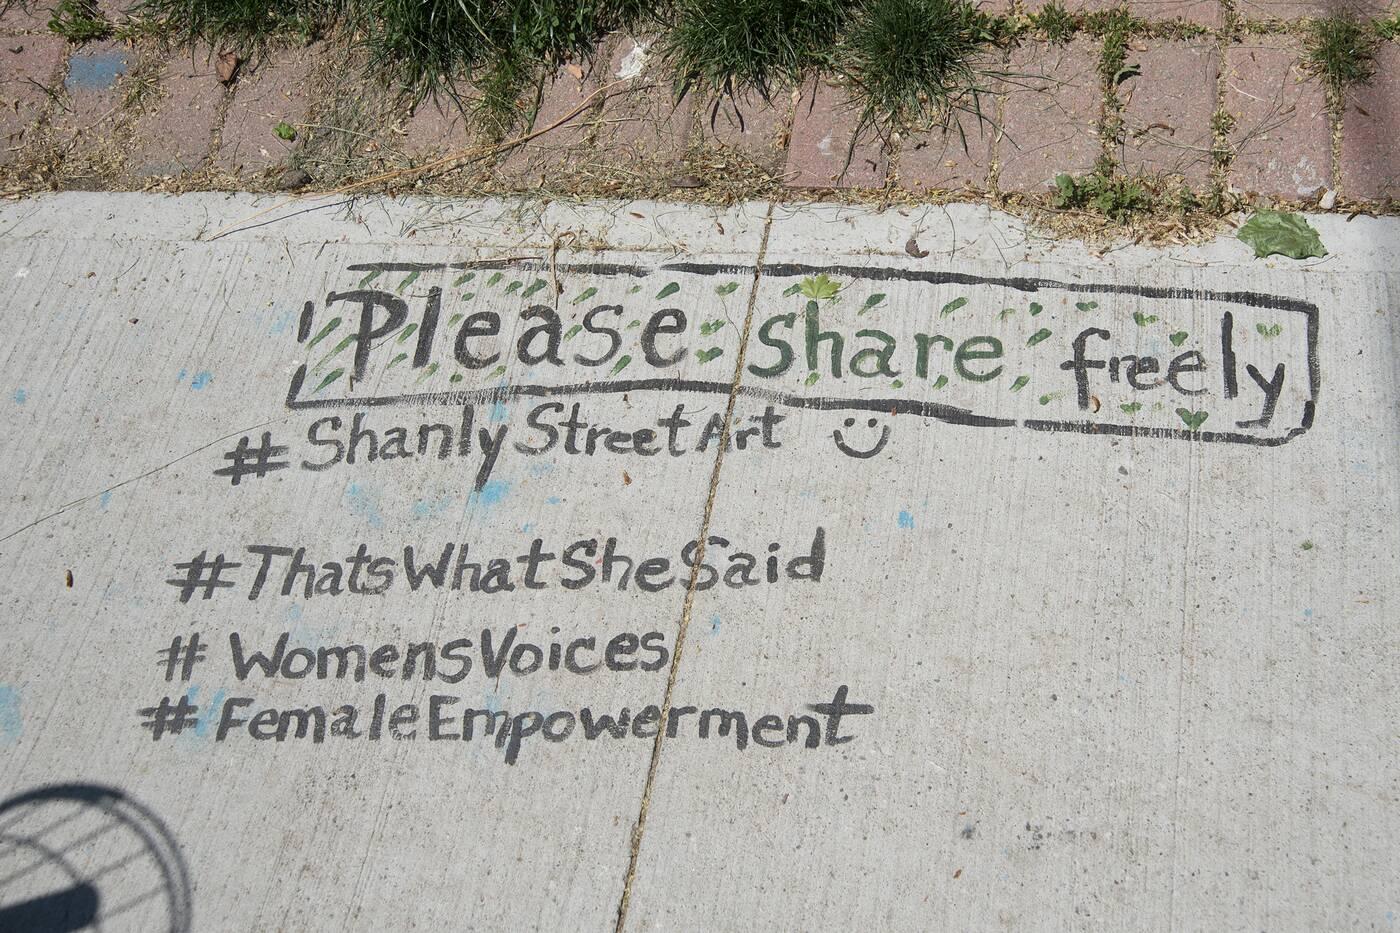 shanly street art